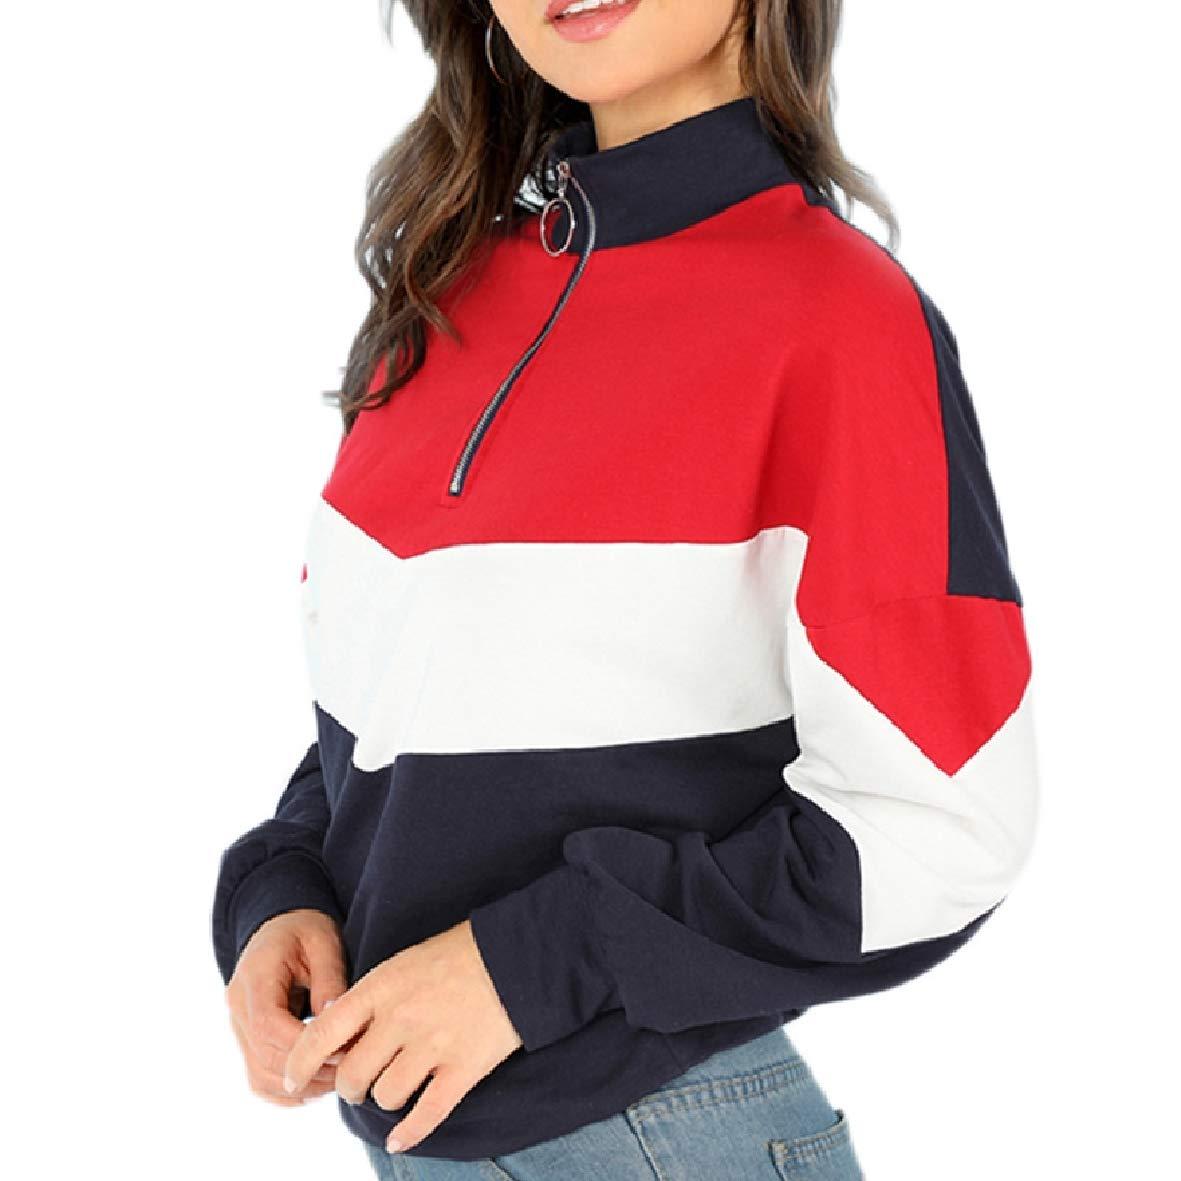 Tootless-Women Spell Color Zip-Up Stand-up Collar Long Sleeve Weekend PU Outwear